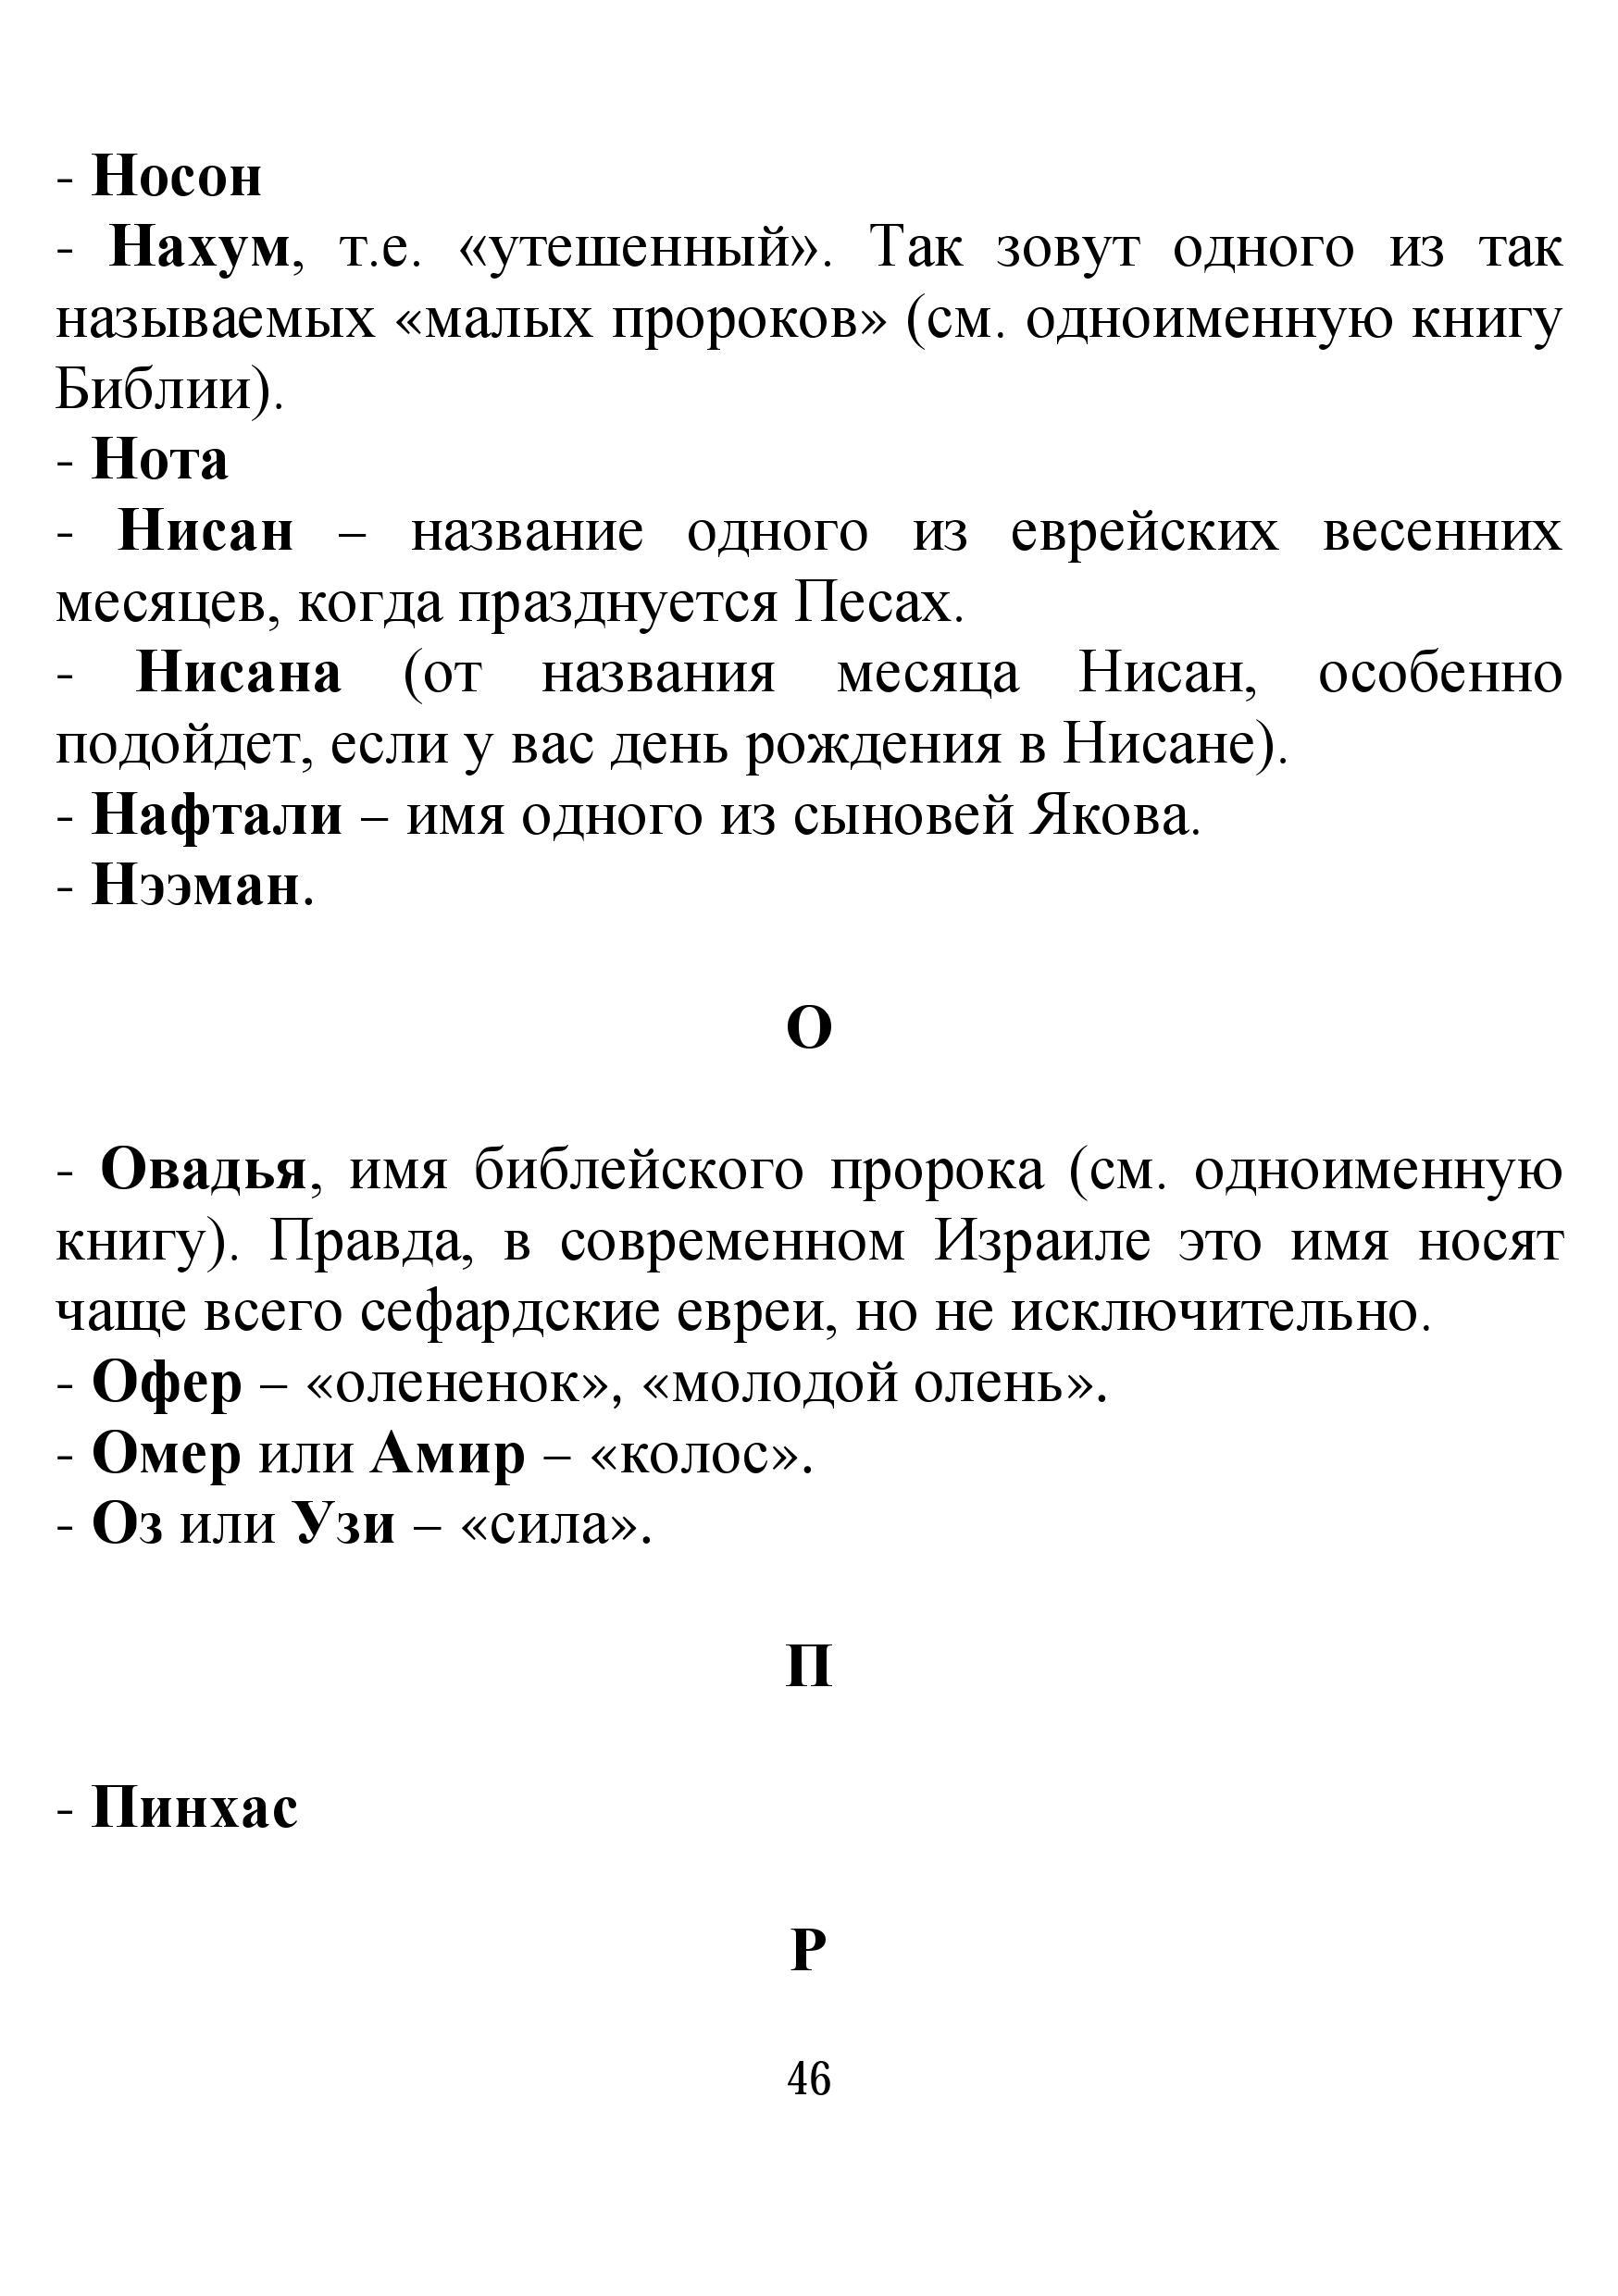 http://s2.uploads.ru/Q5fKH.jpg